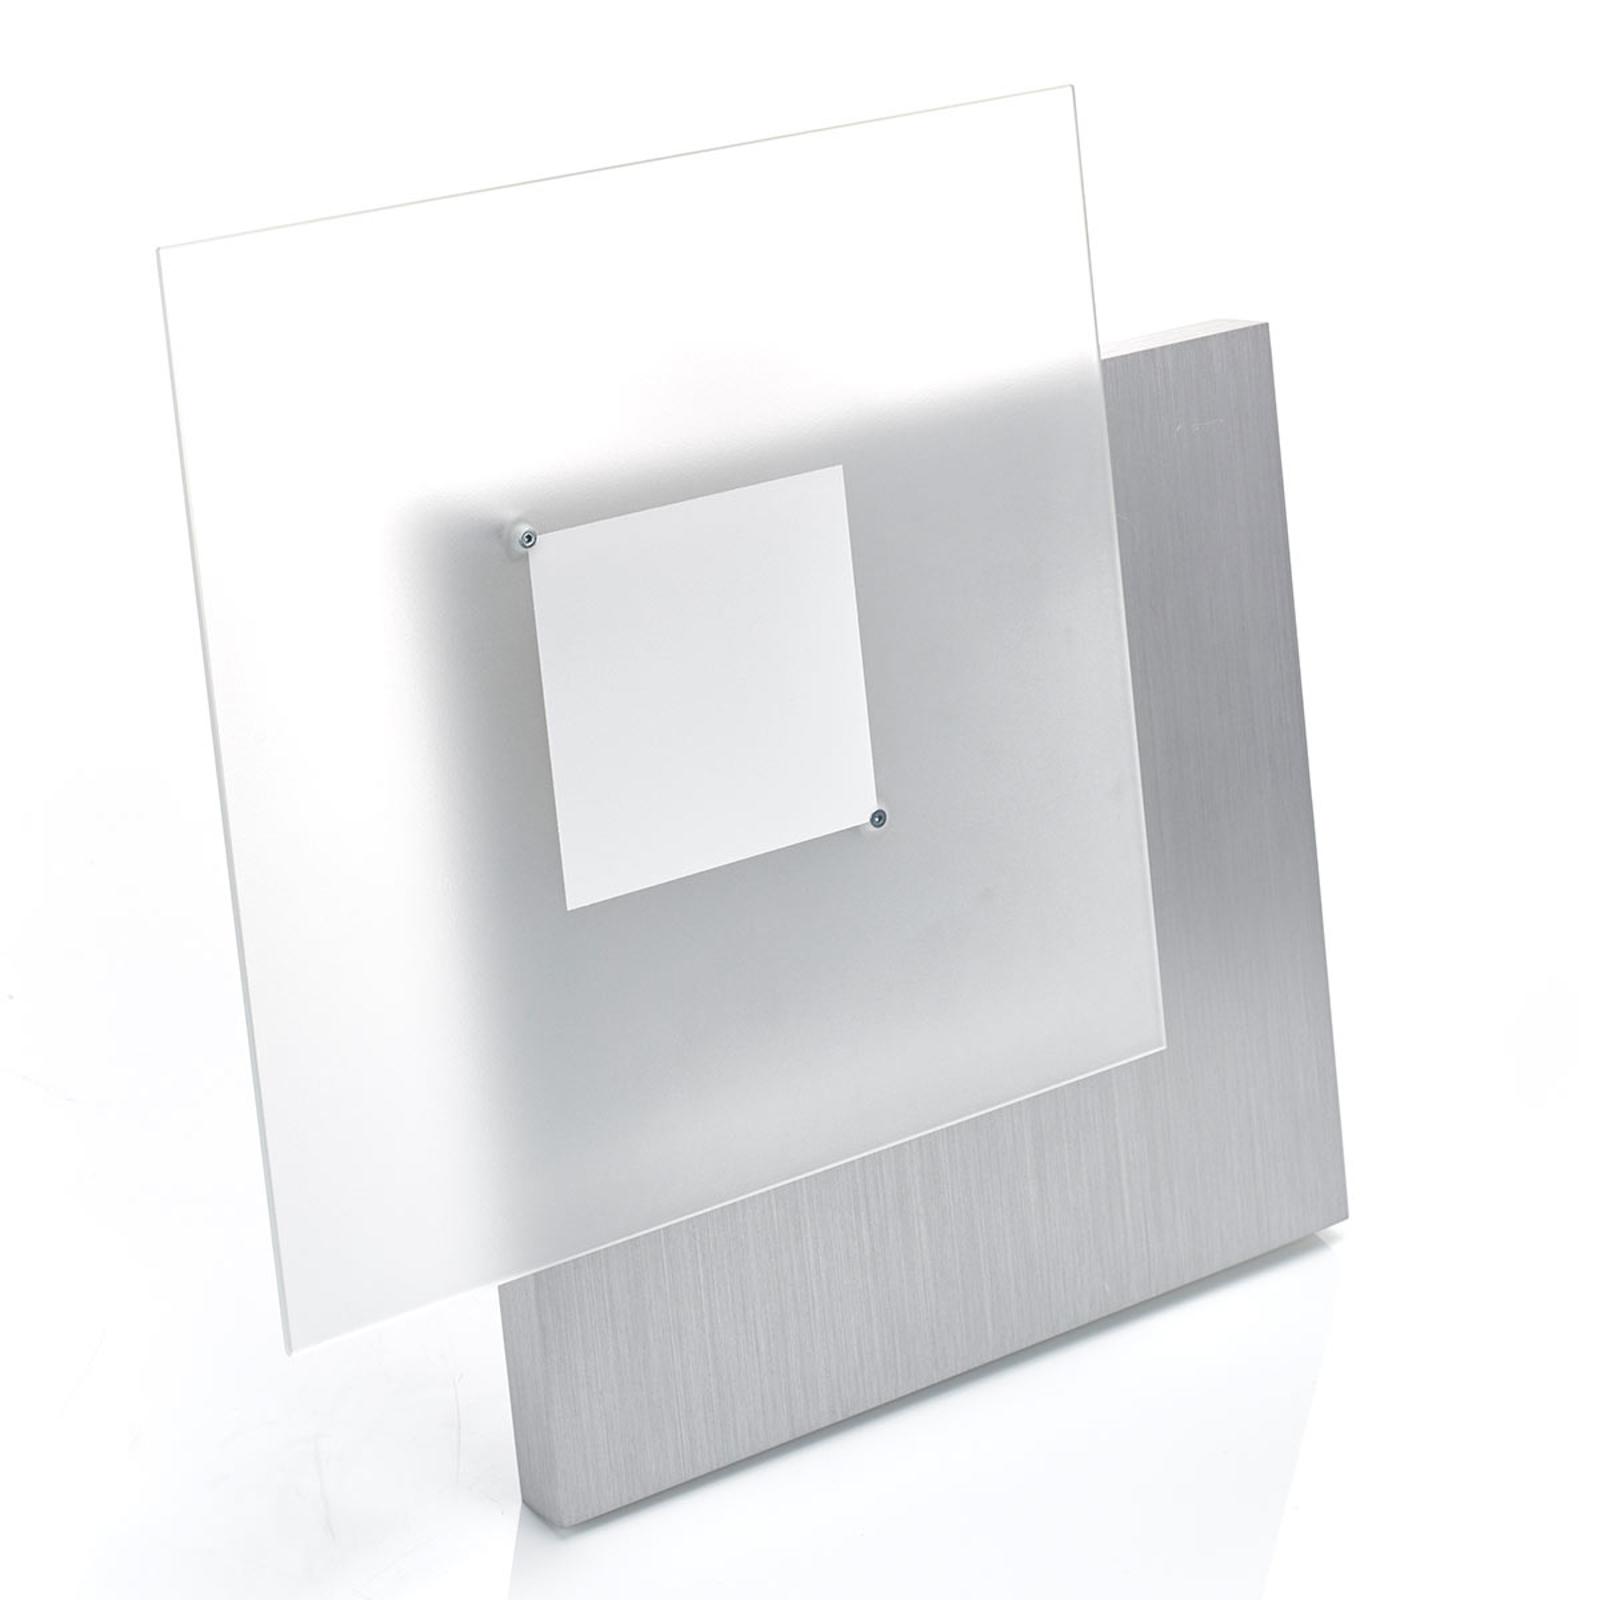 Opvallende LED-plafondlamp Flat, dimbaar